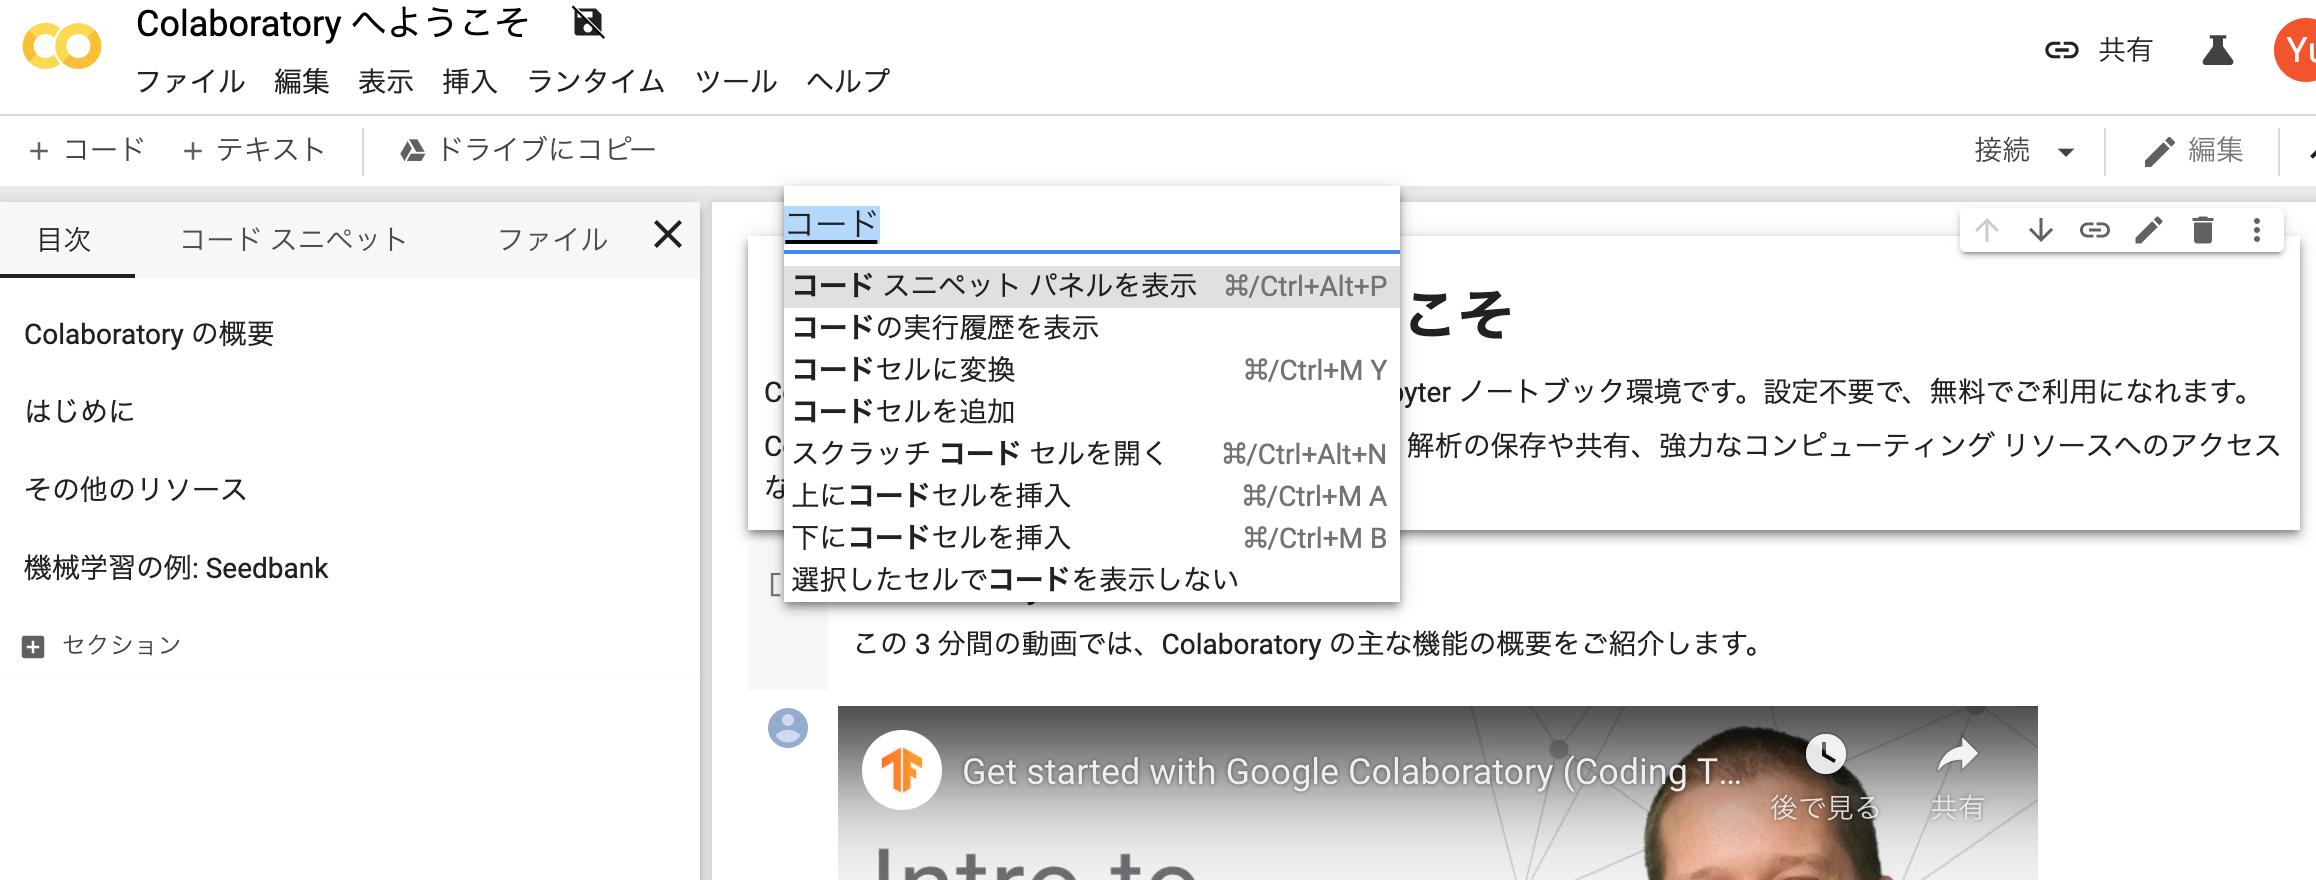 googlecolab ( Google Colaboratory )